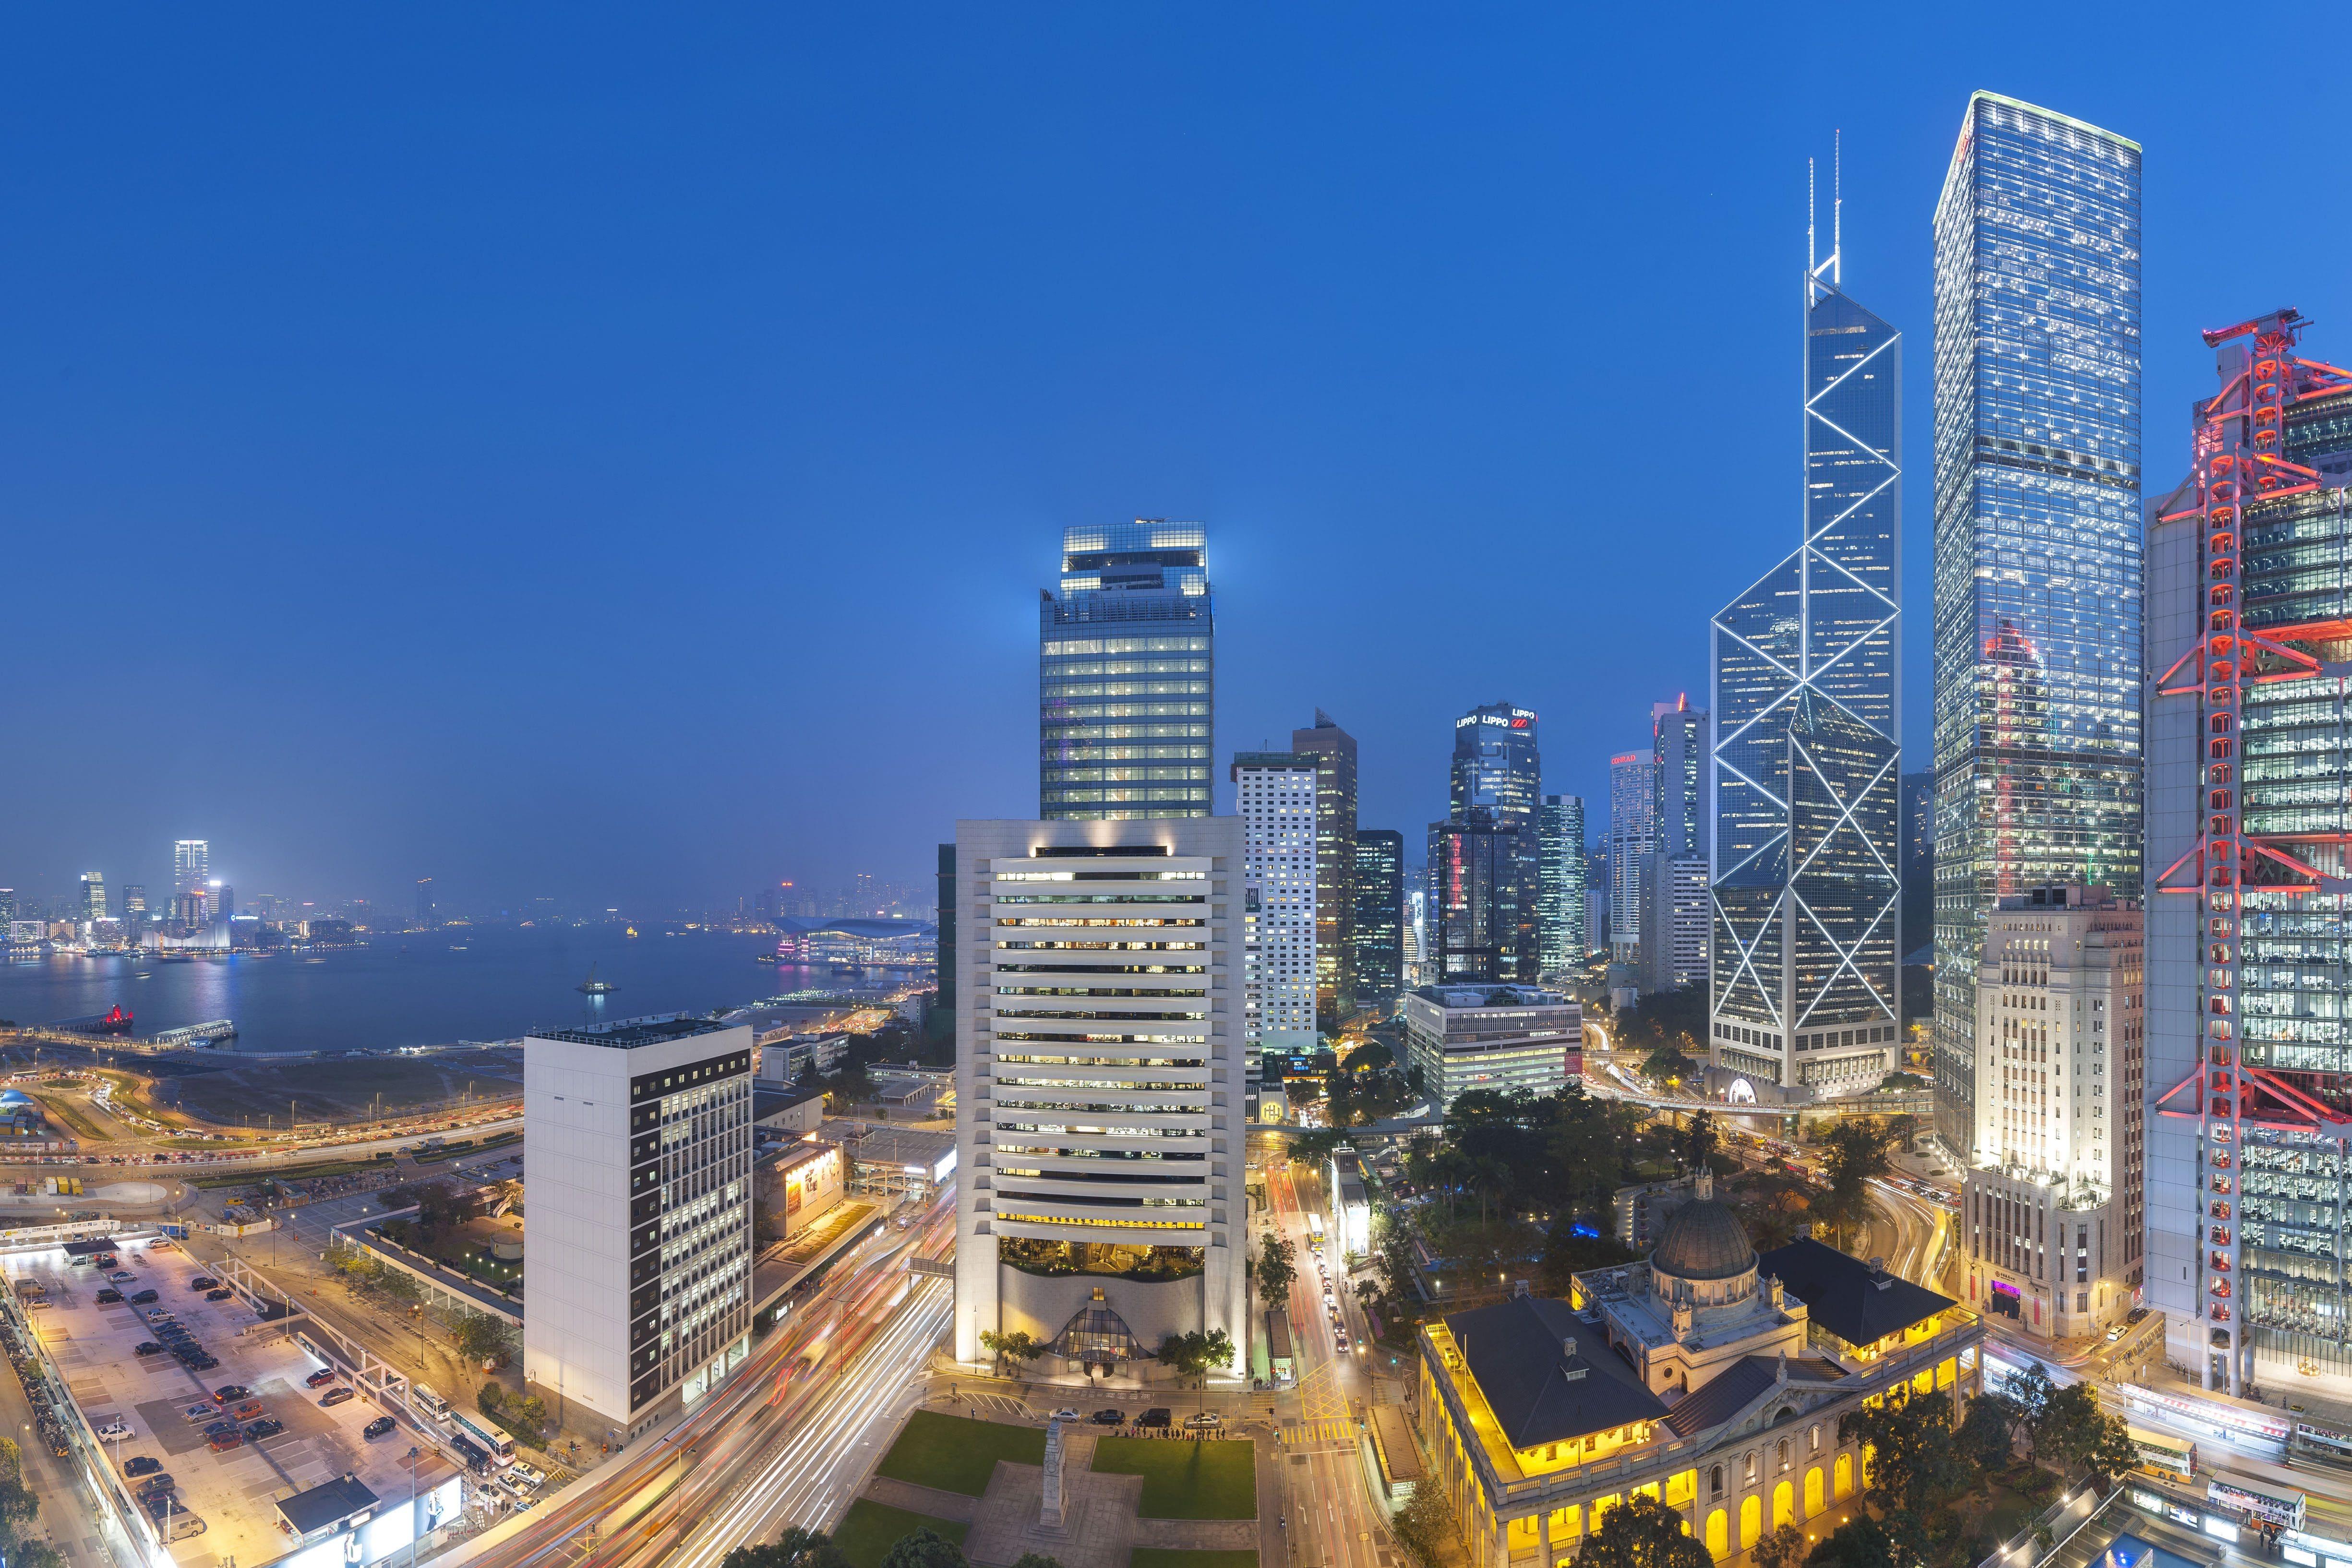 Mandarin Oriental Hong Kong - Mandarin Oriental